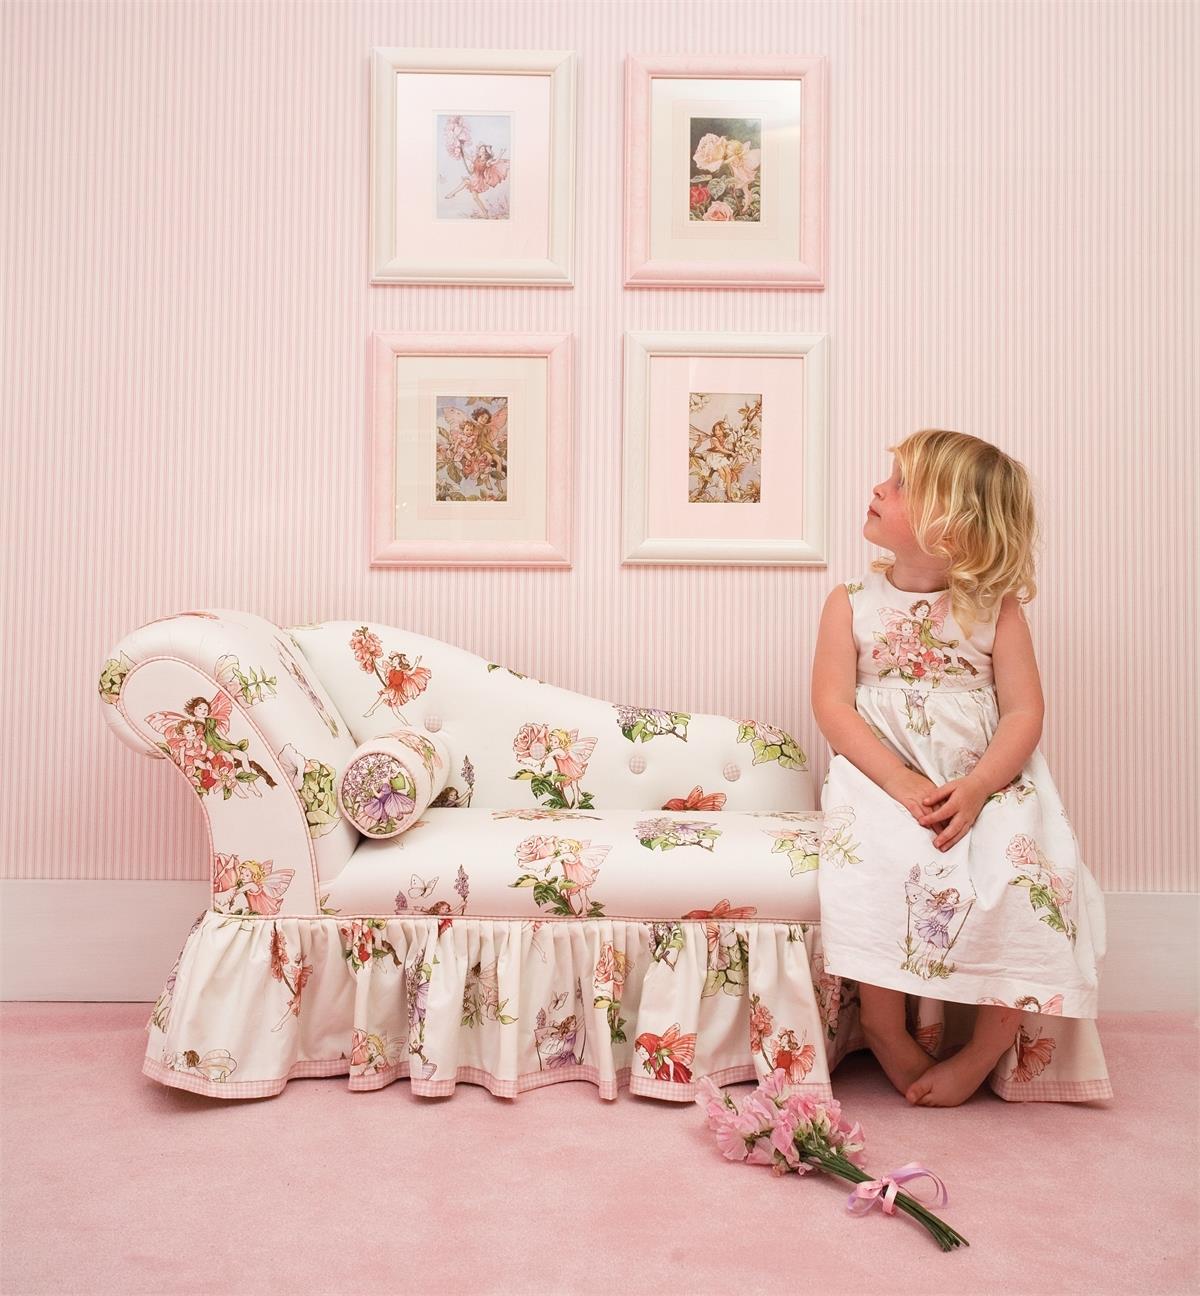 Flower Fairy / Nessa`s Roses chaise lounge - на 360.ru: цены, описание, характеристики, где купить в Москве.